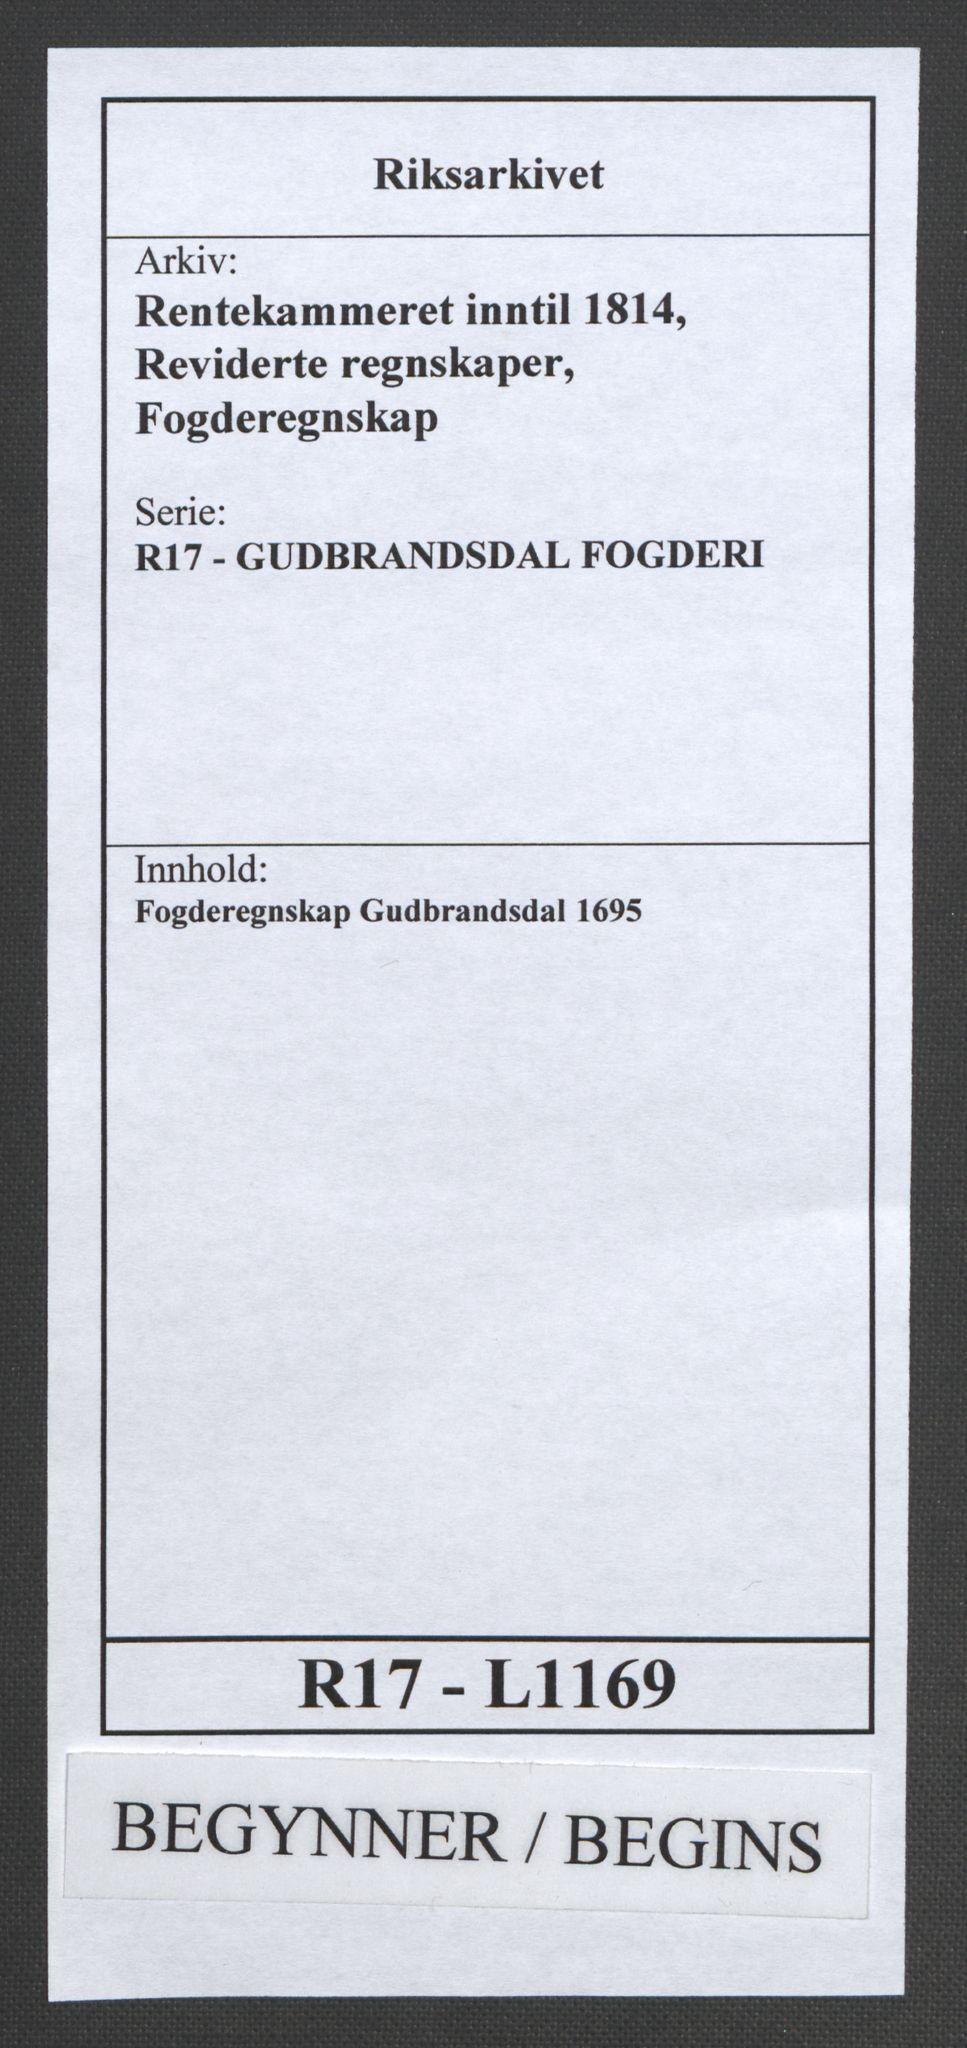 RA, Rentekammeret inntil 1814, Reviderte regnskaper, Fogderegnskap, R17/L1169: Fogderegnskap Gudbrandsdal, 1695, s. 1